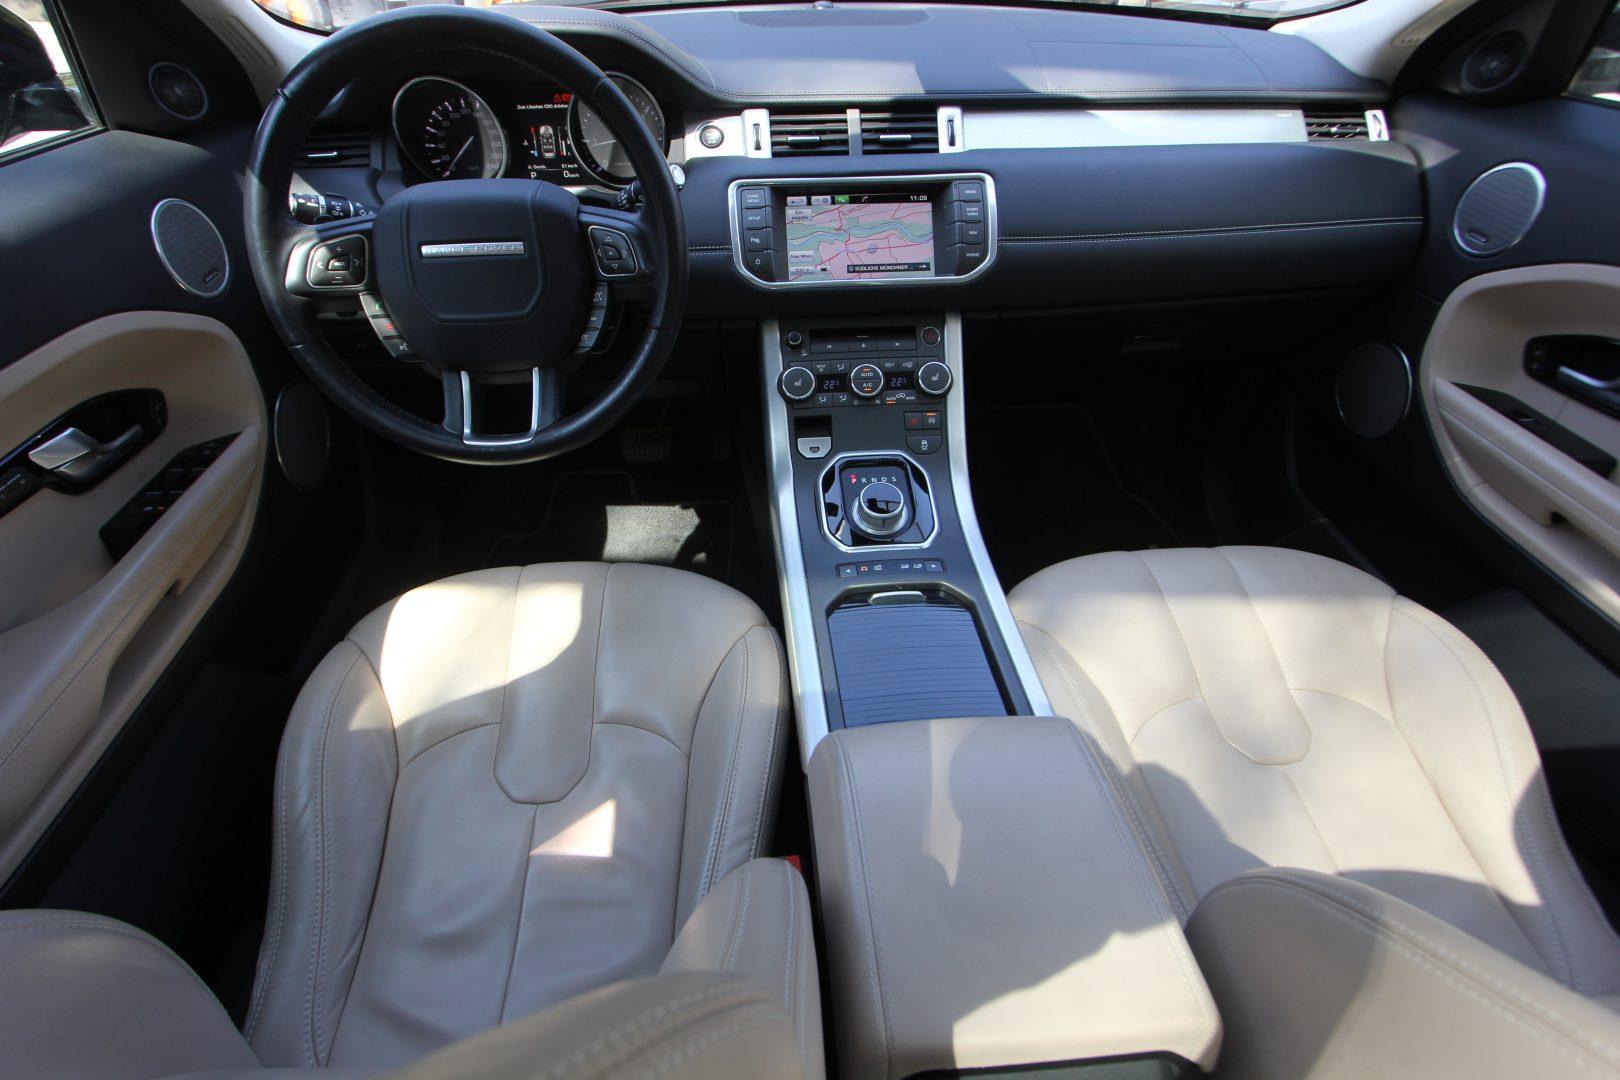 AIL Land Rover Range Rover Evoque Prestige 11